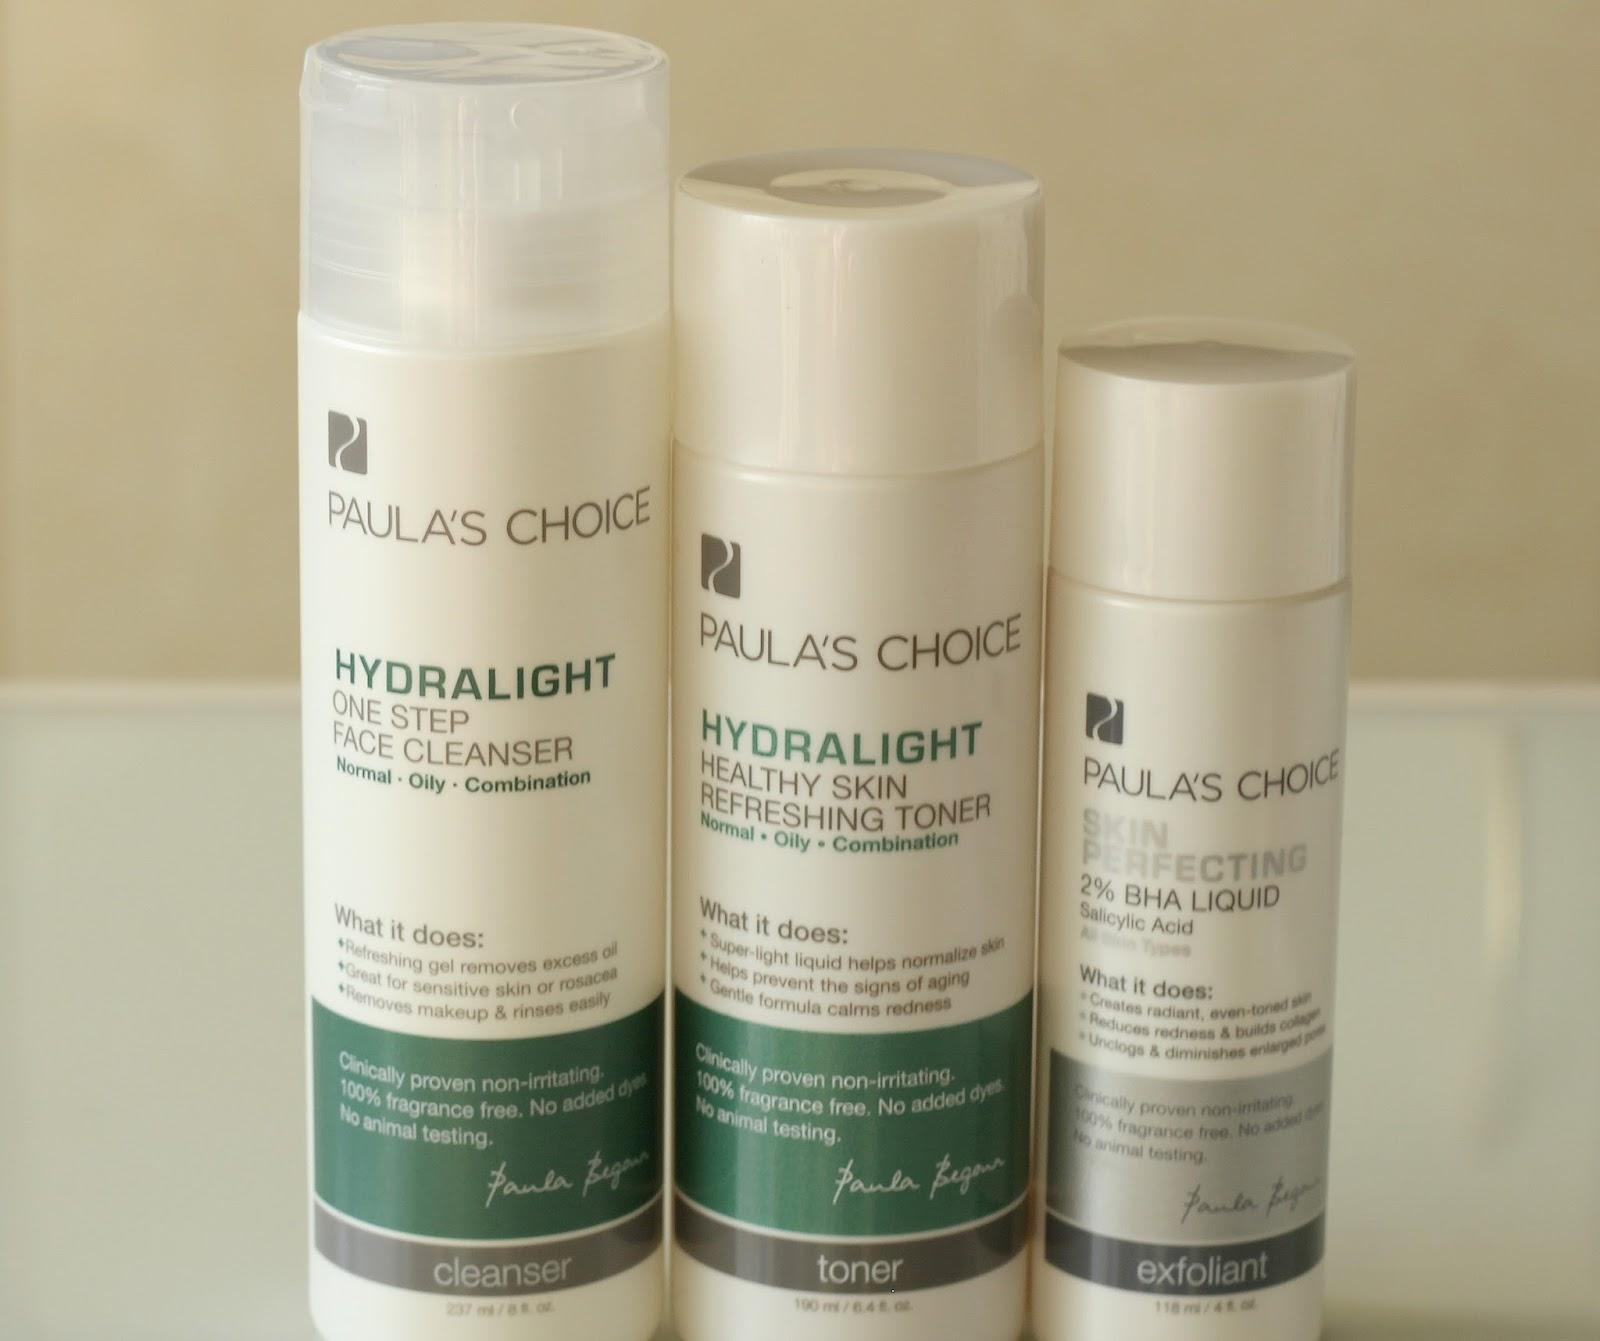 Paula's Choice Hydralight One Step Face Cleanser Healthy Skin Refreshing Toner Skin Perfecting 2% BHA Liquid